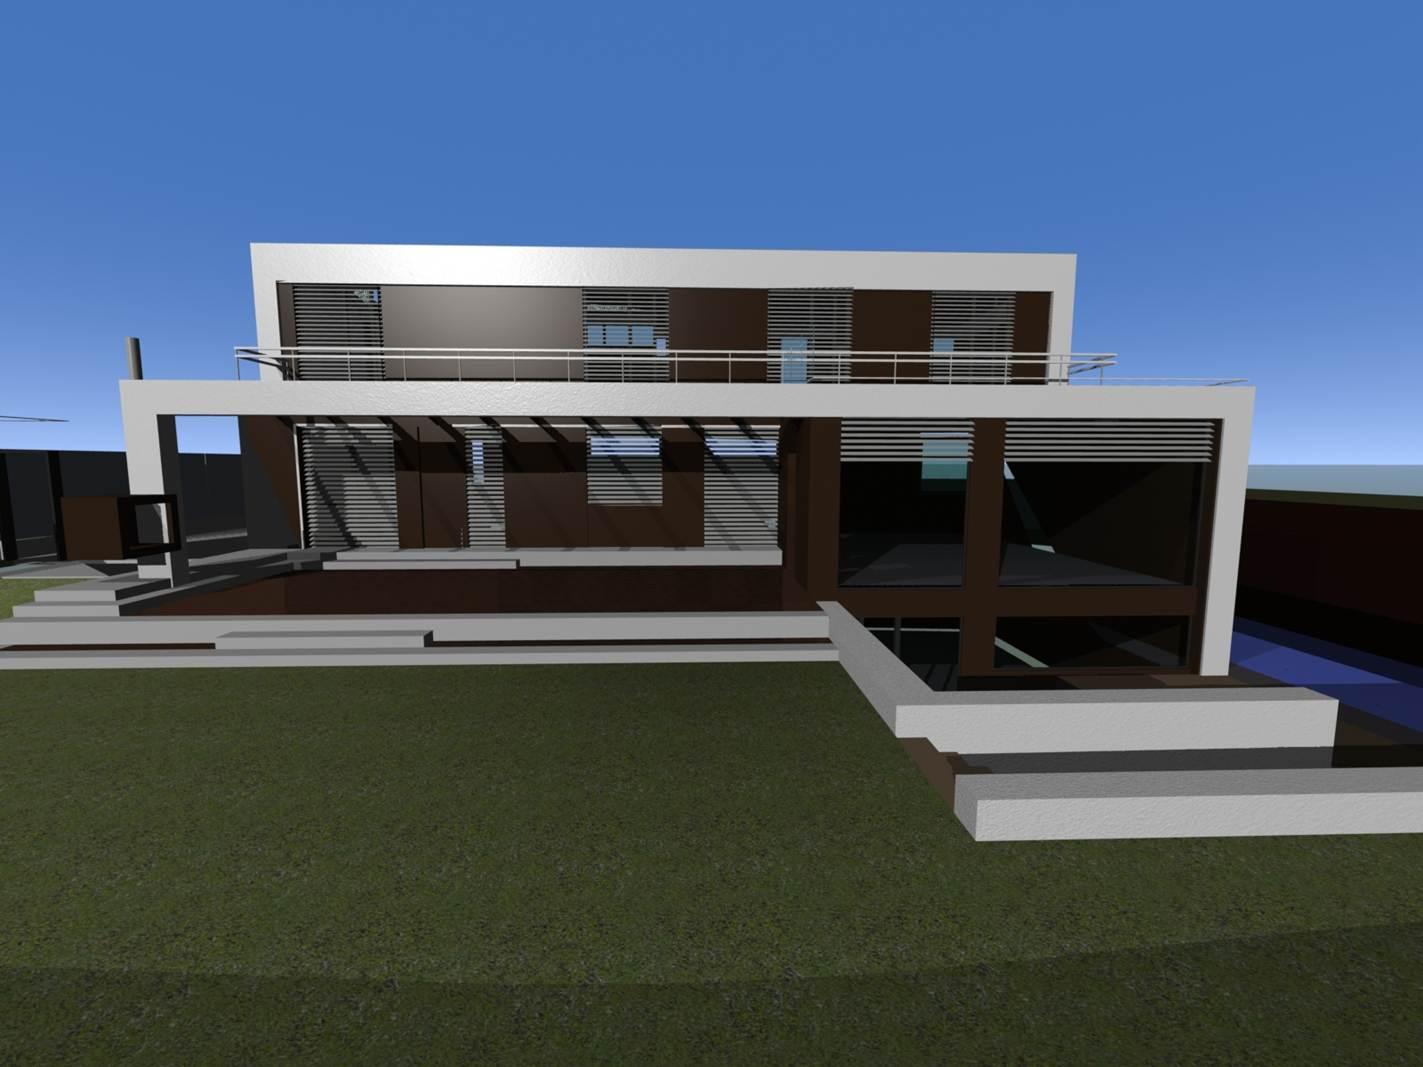 Predaj Rozostavany 6 Izbovy Rodinny Dom Stare Grunty Top Reality